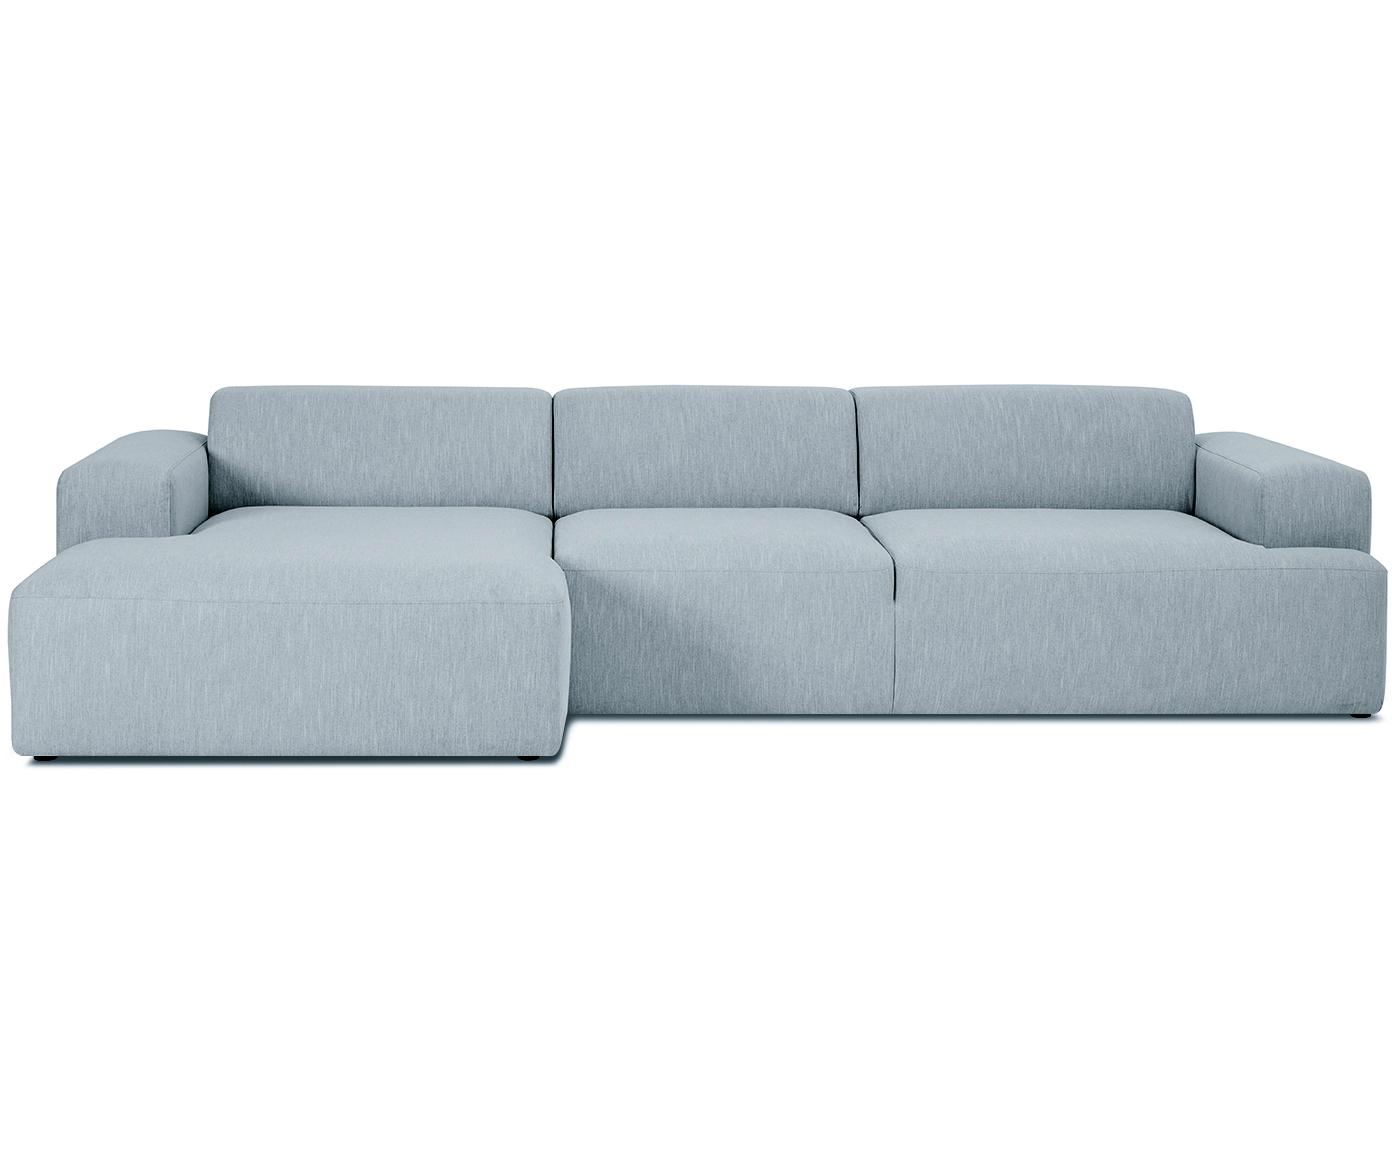 Hoekbank Melva (4-zits), Bekleding: polyester, Frame: massief grenenhout, spaan, Poten: grenenhout, Geweven stof blauwgrijs, B 319 x D 144 cm